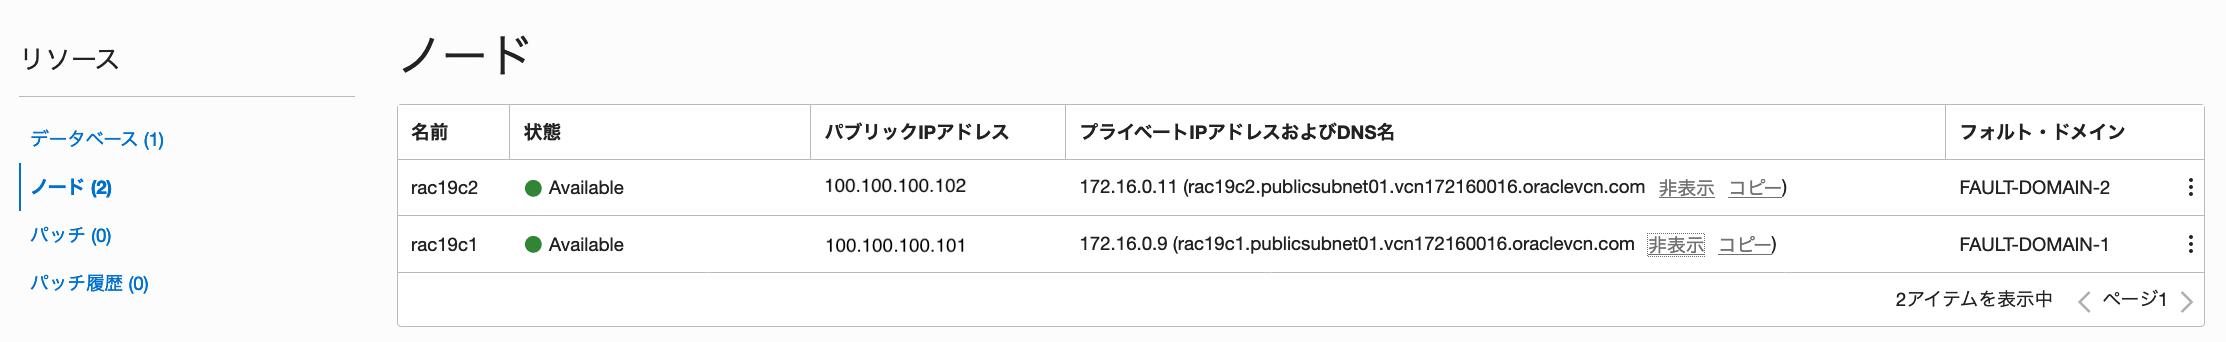 03_RAC画面_Node02.png